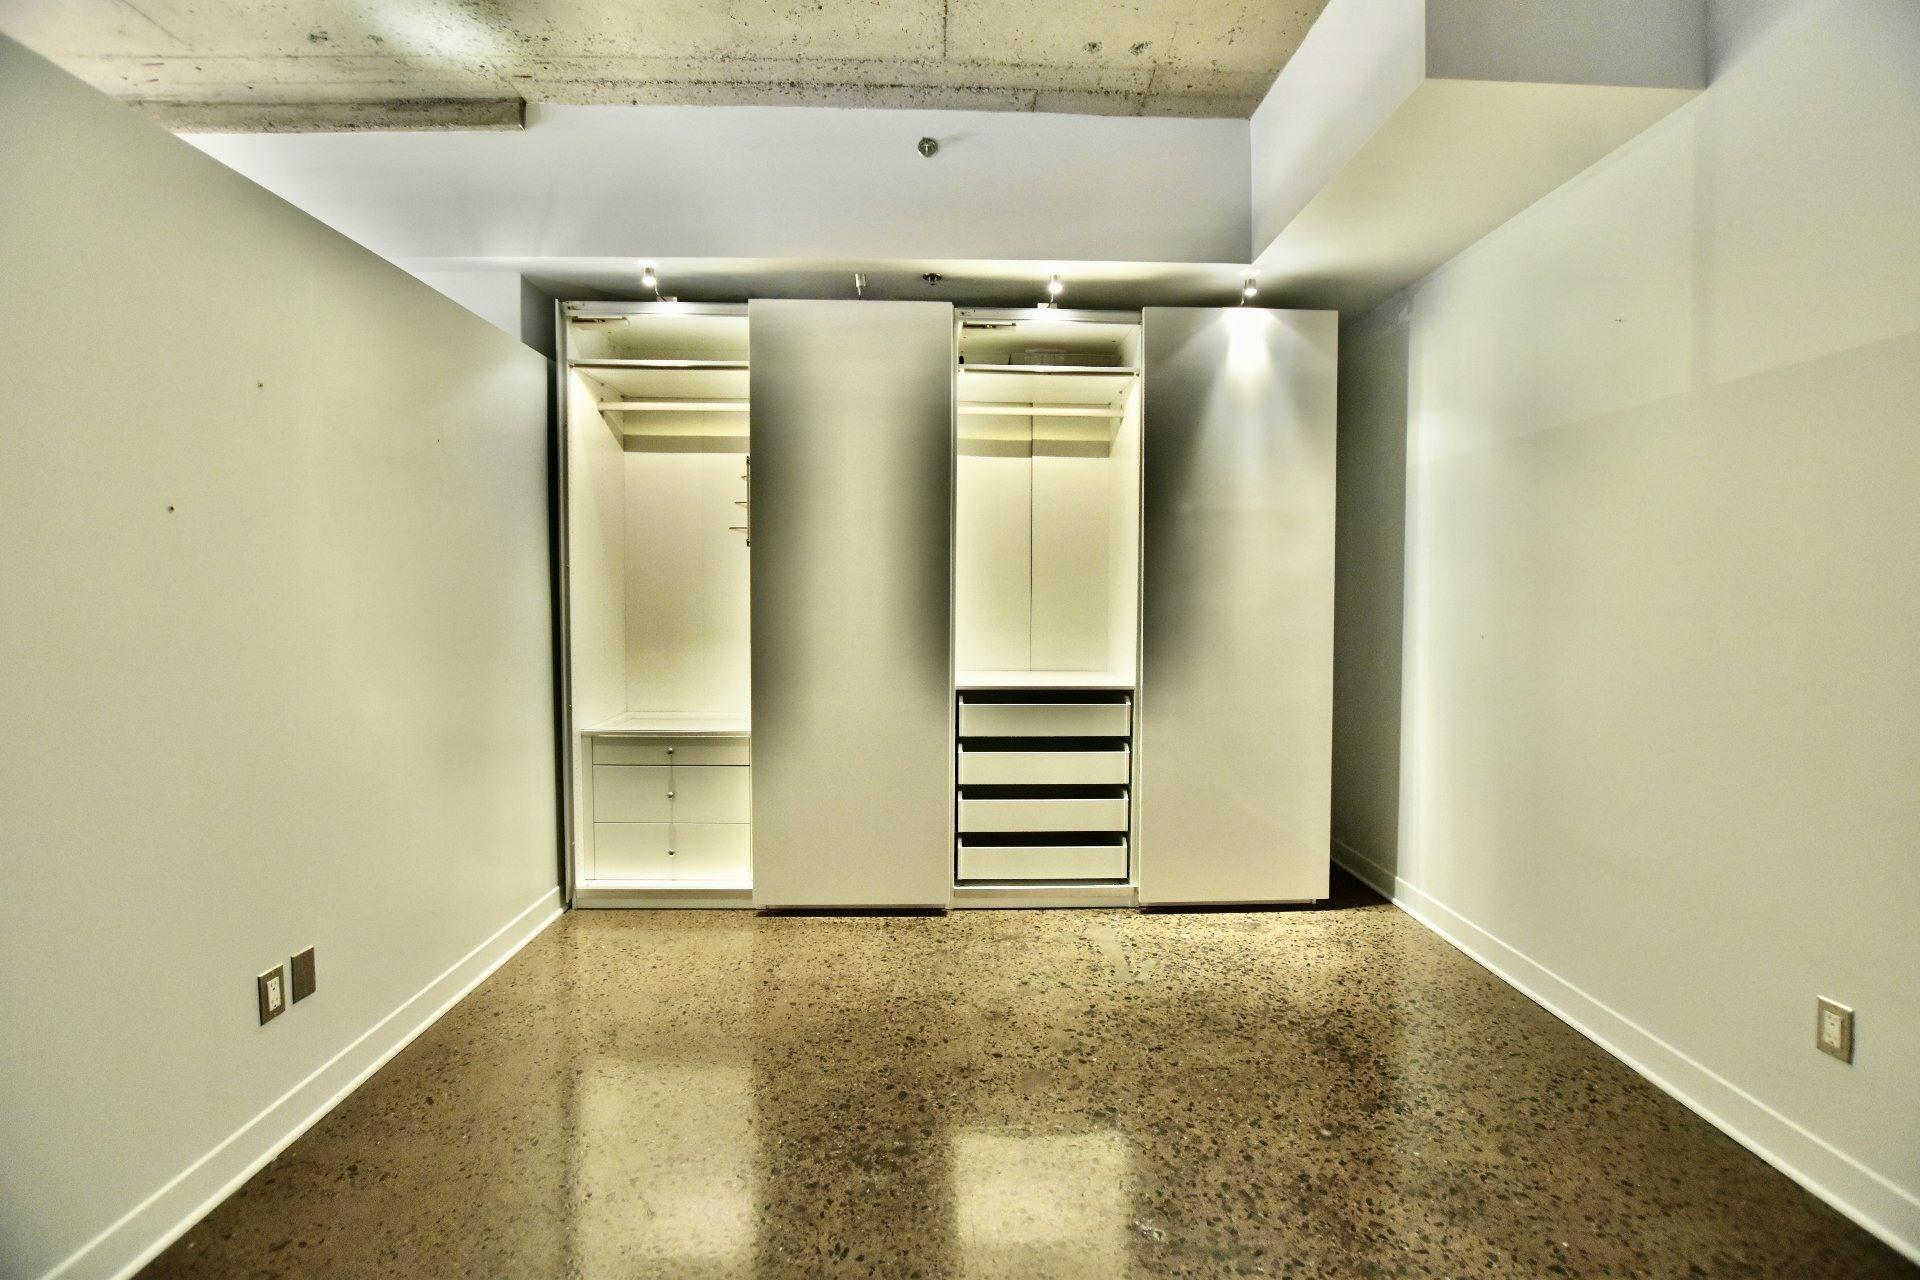 image 16 - Departamento Para alquiler Villeray/Saint-Michel/Parc-Extension Montréal  - 5 habitaciones